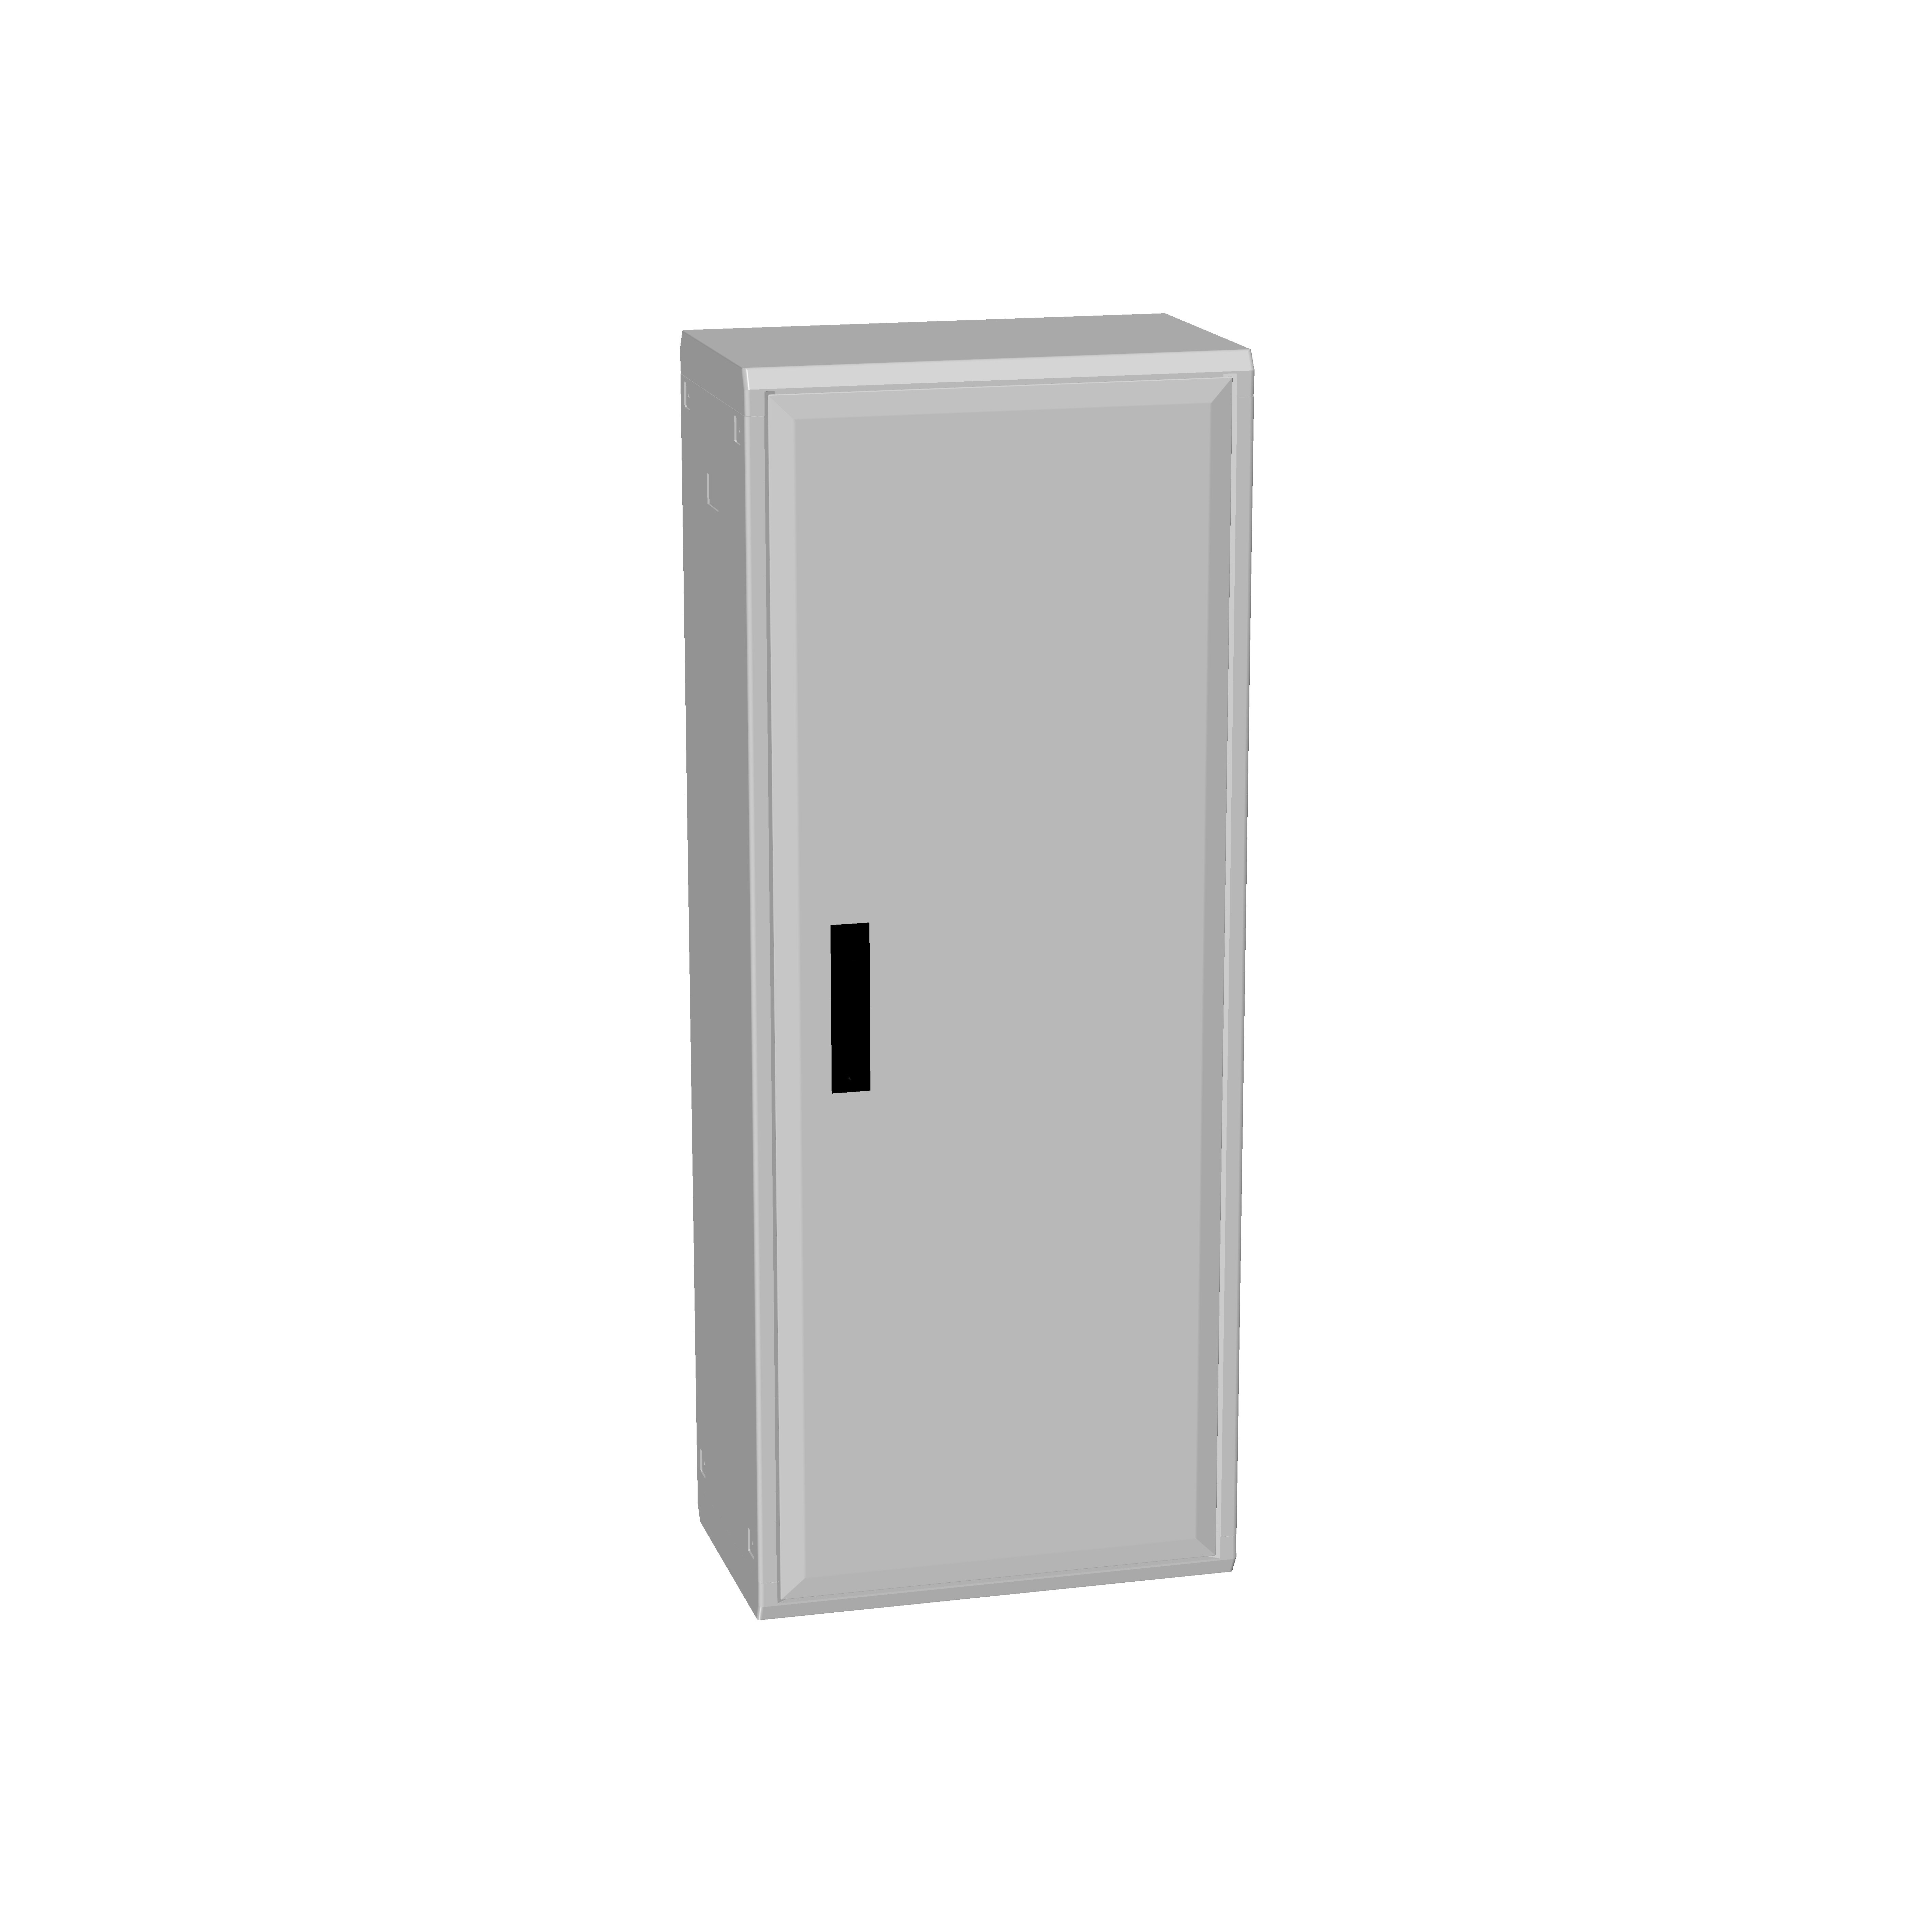 1 Stk Polyesterschrank, eintürig, 1250x500x312 POCC5230--